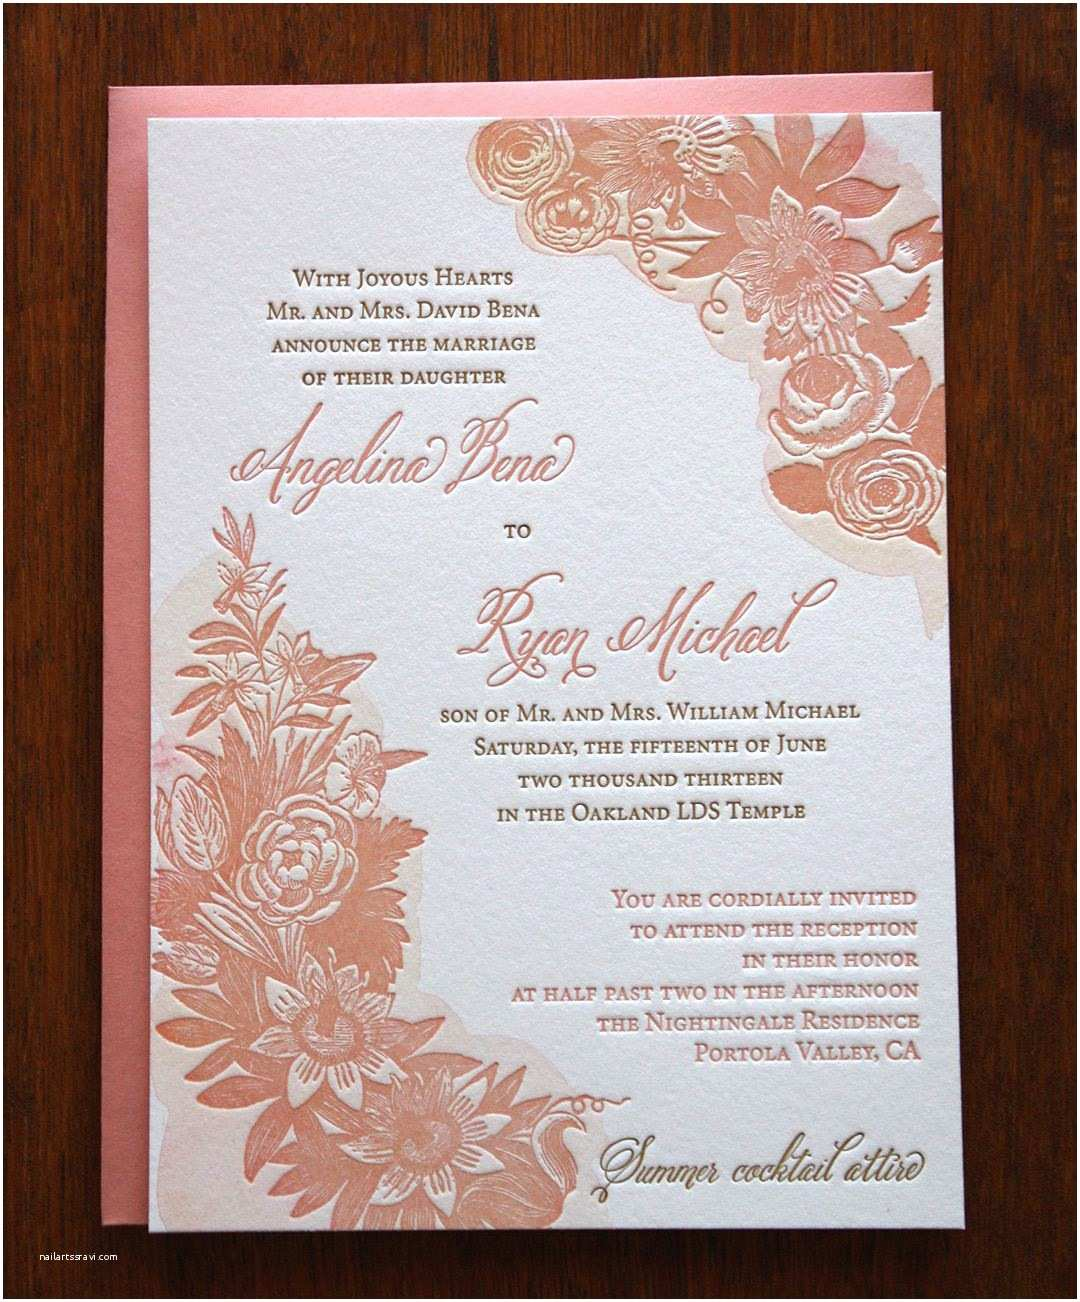 Wedding Invitation Ecards Wedding Invitation Printing Designs Ideas